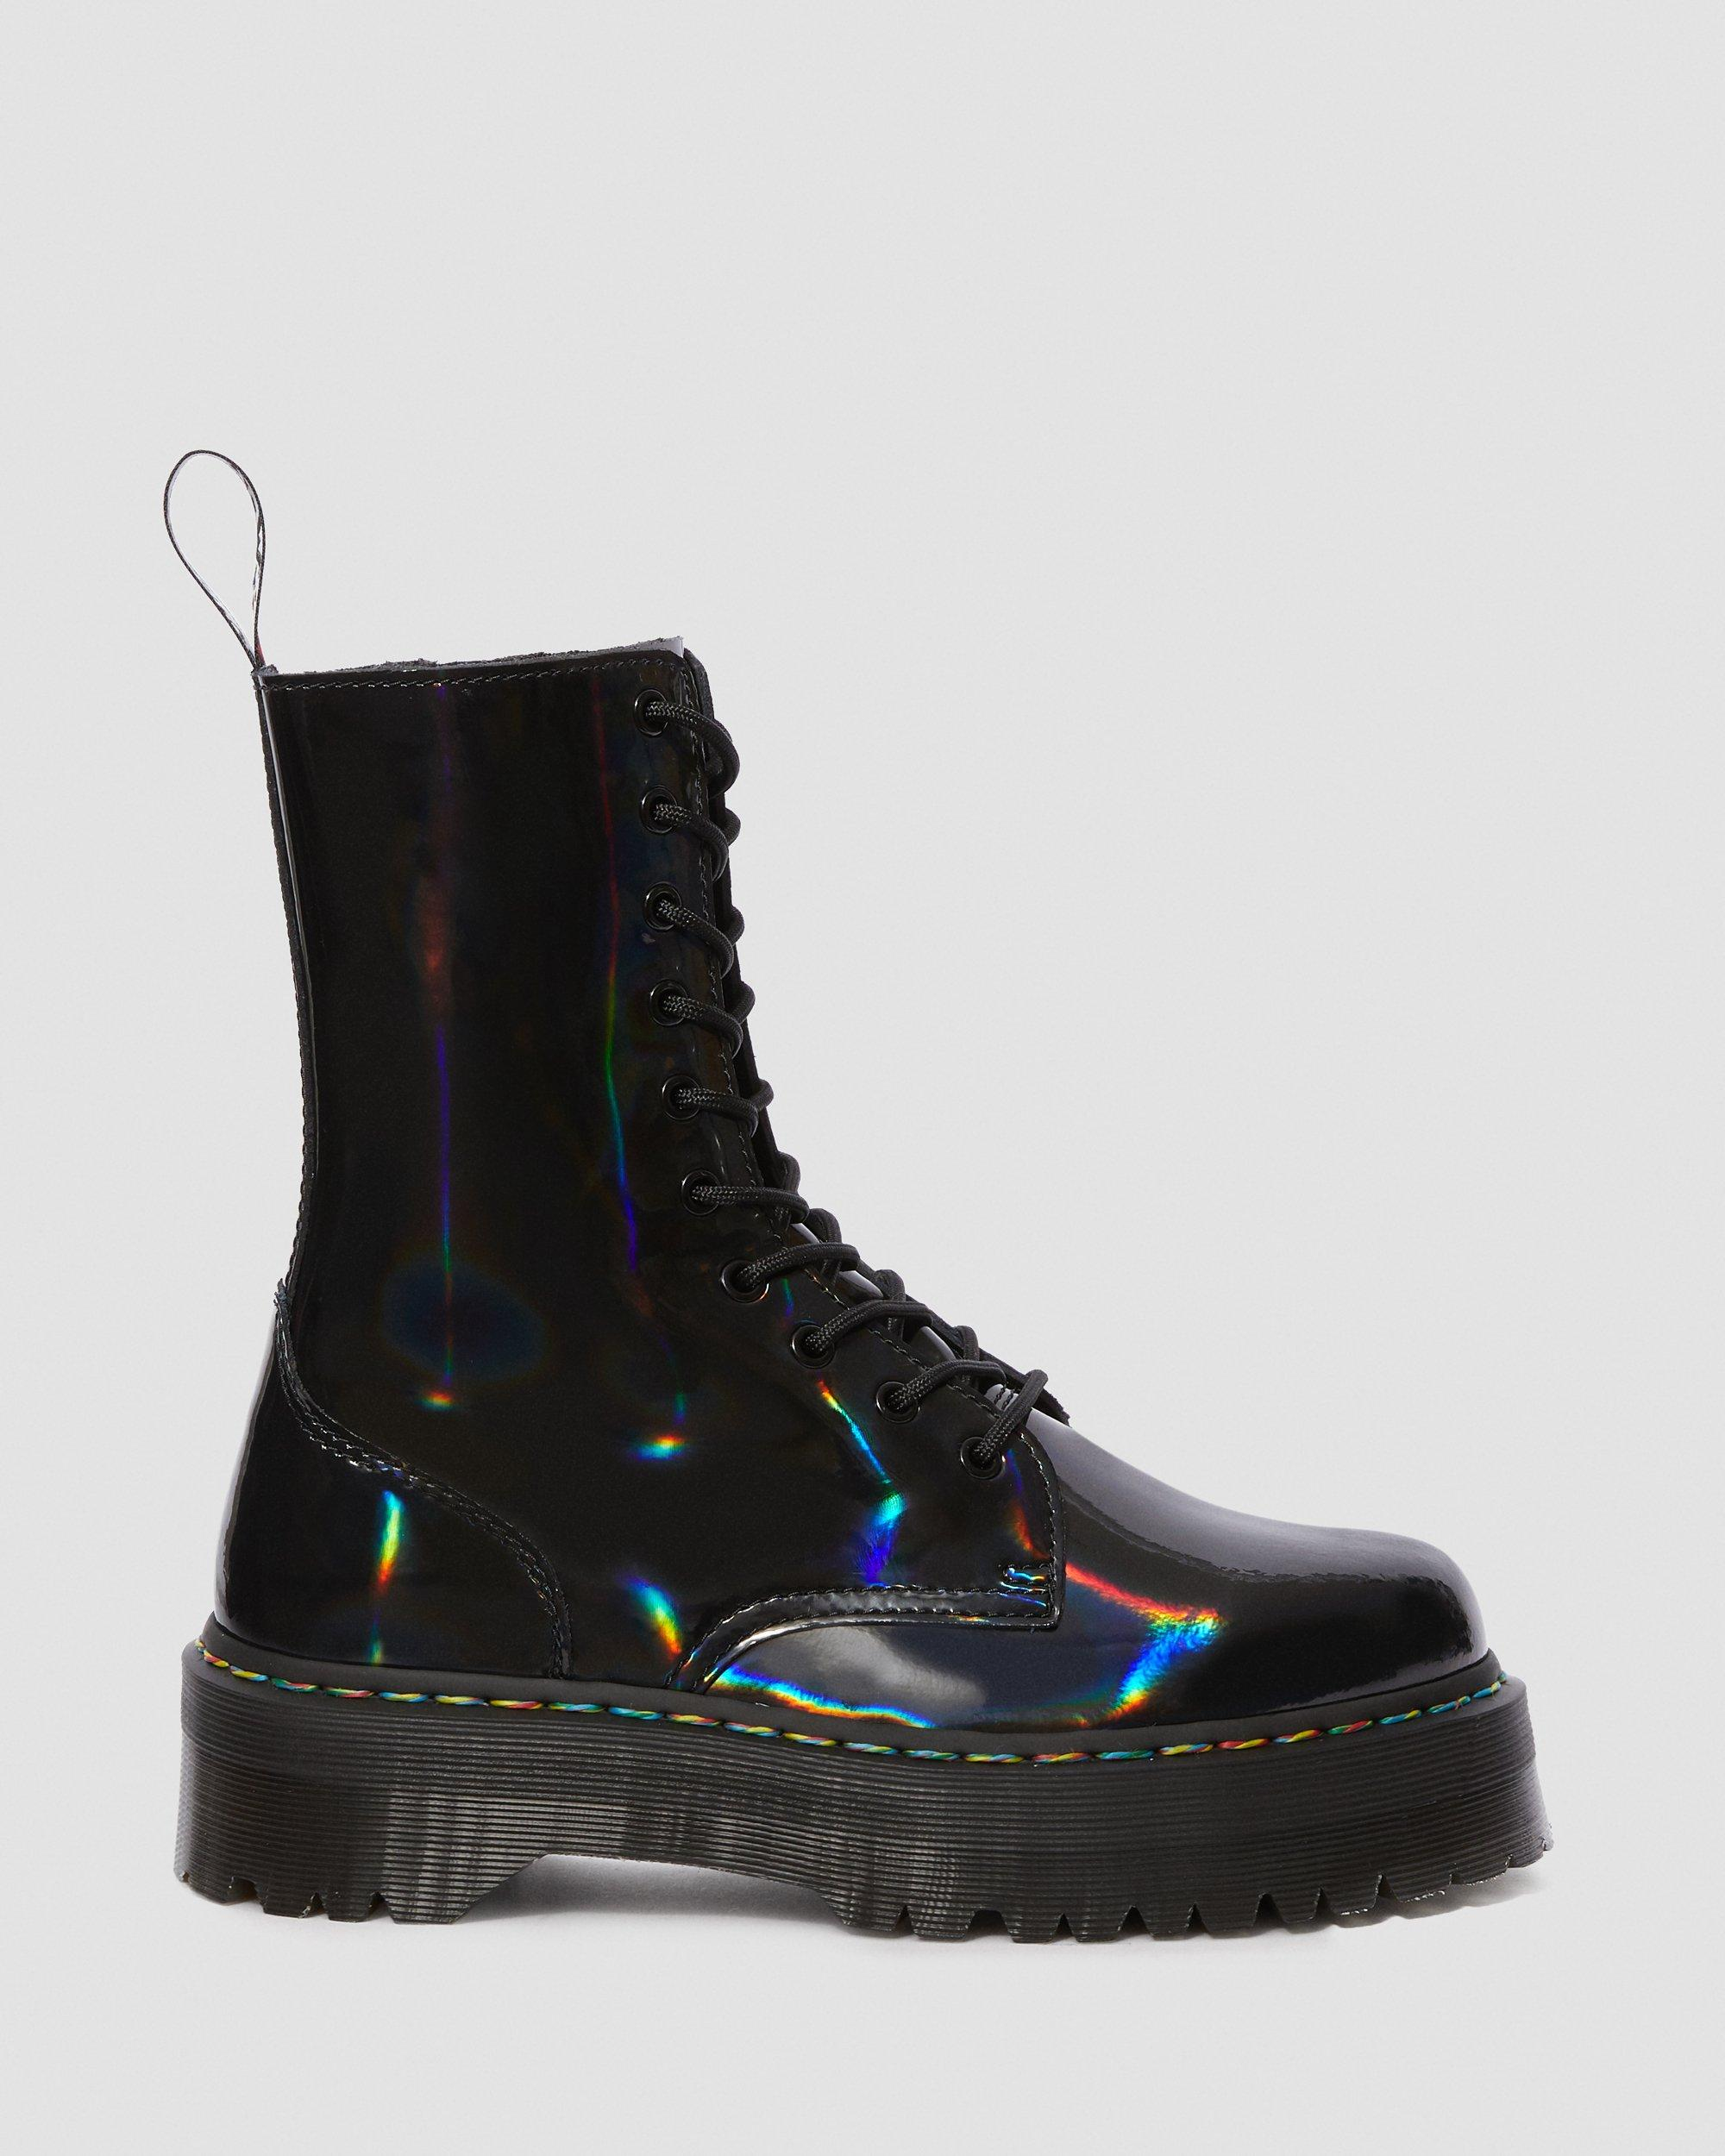 doc martens rainbow boots